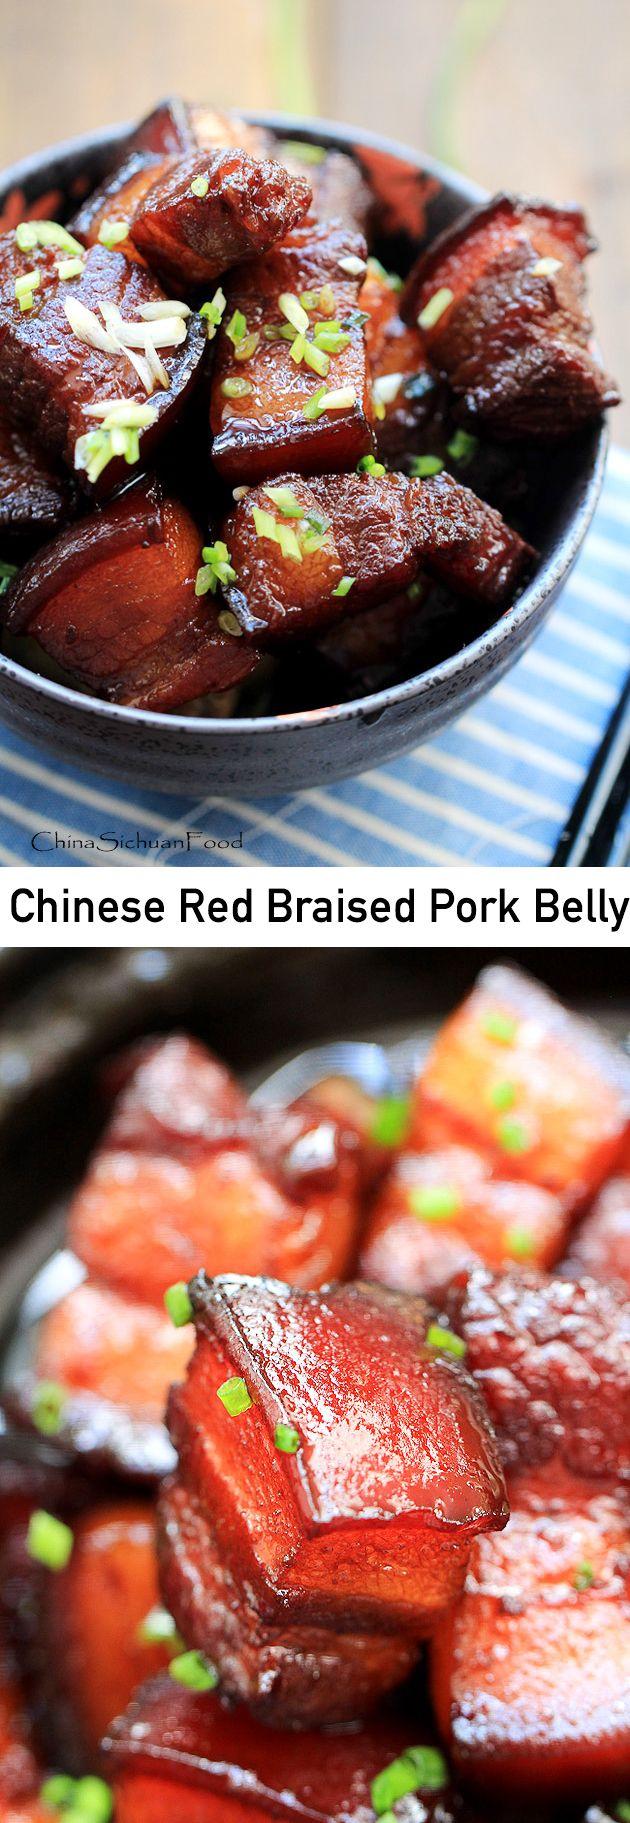 Chinese red braised pork belly--#Chinese #HongShaoRou